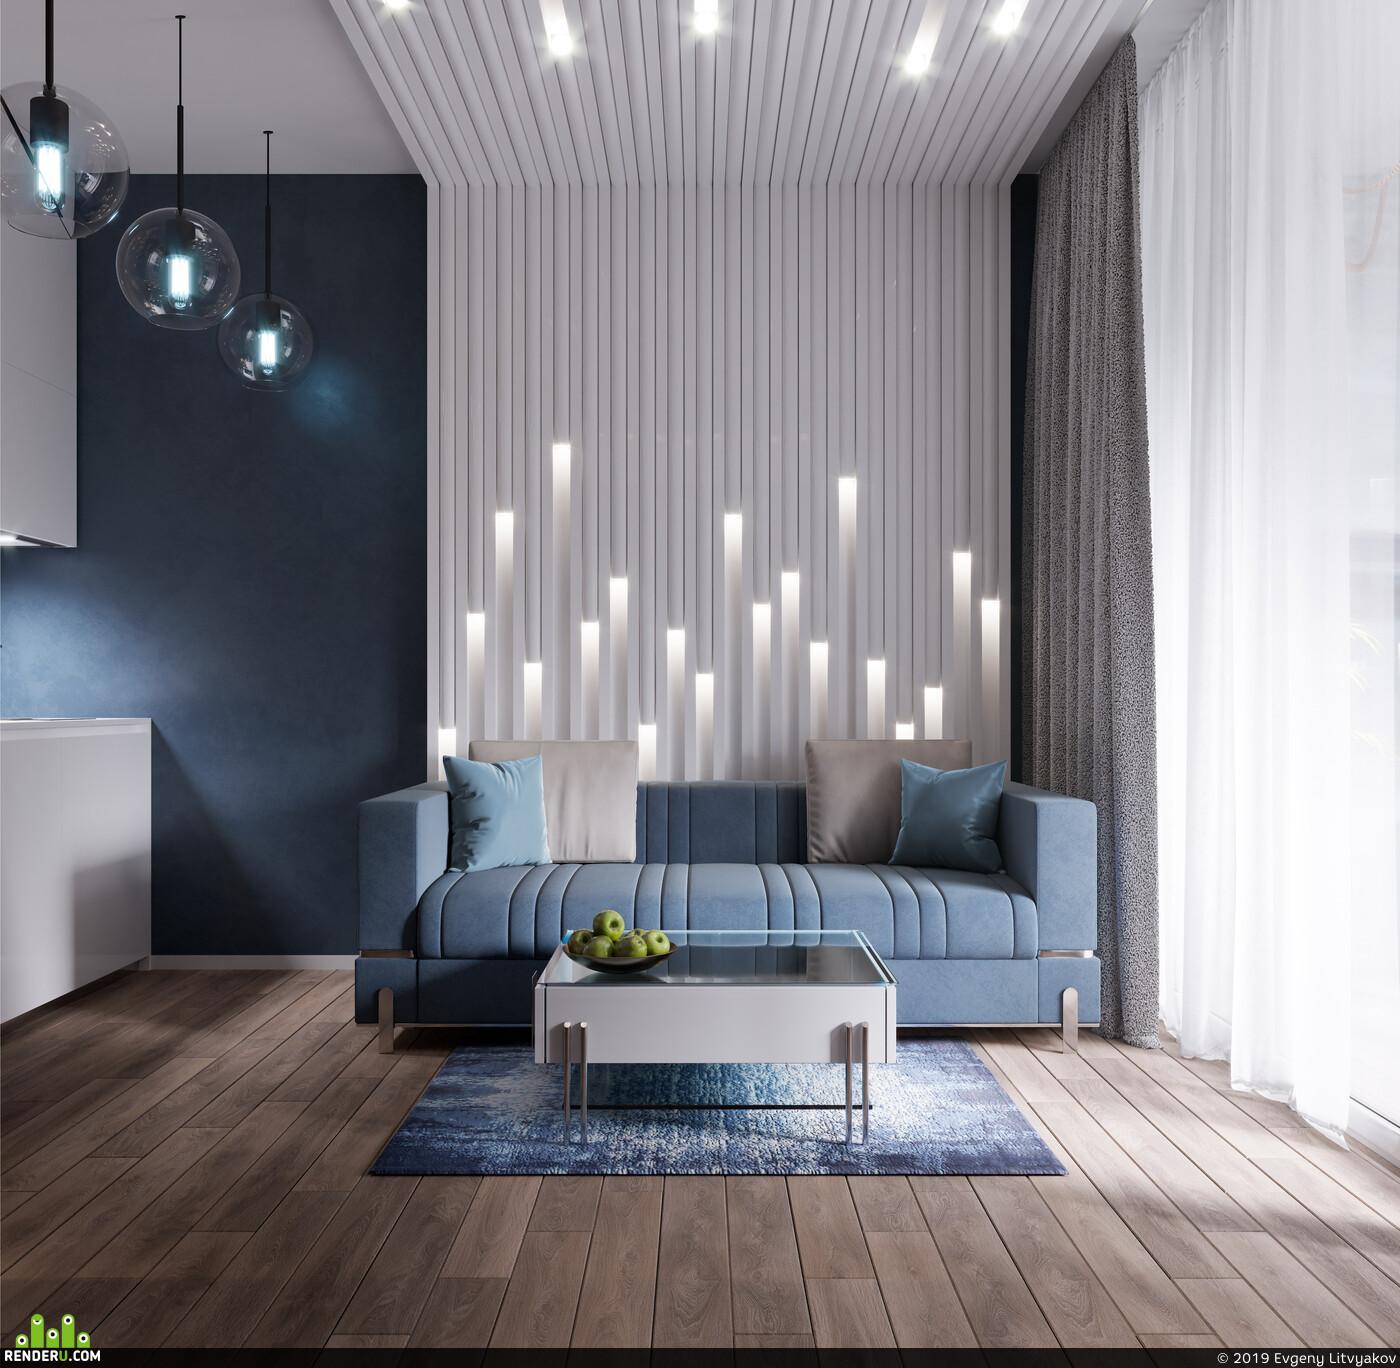 3D Studio Max, 3ds Max, 3D архитектура, интерьер, дизайн интерьера, interior design